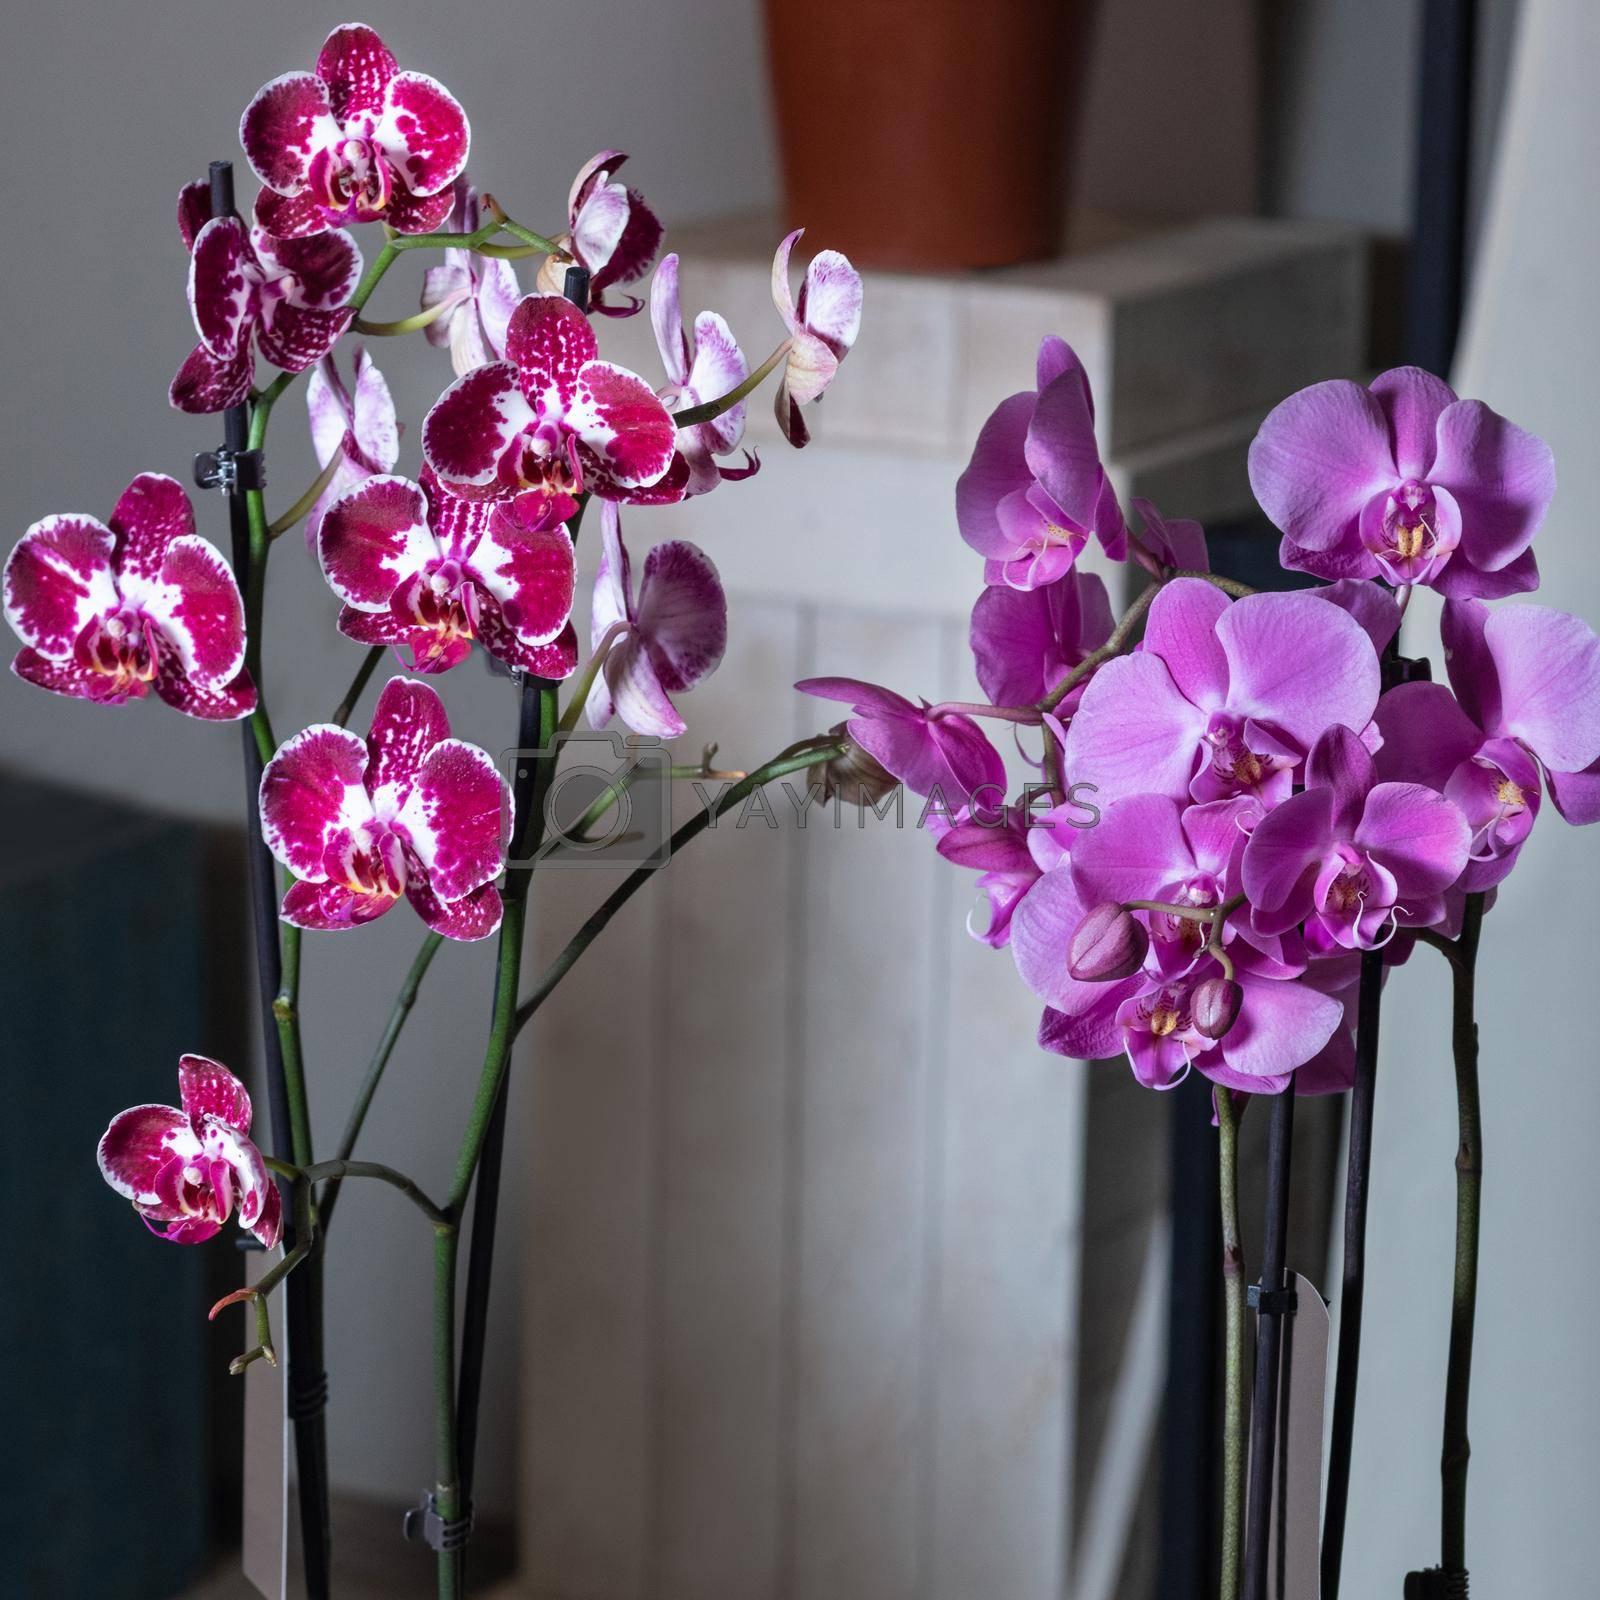 Purple moth orchid flower, phalaenopsis plant close up